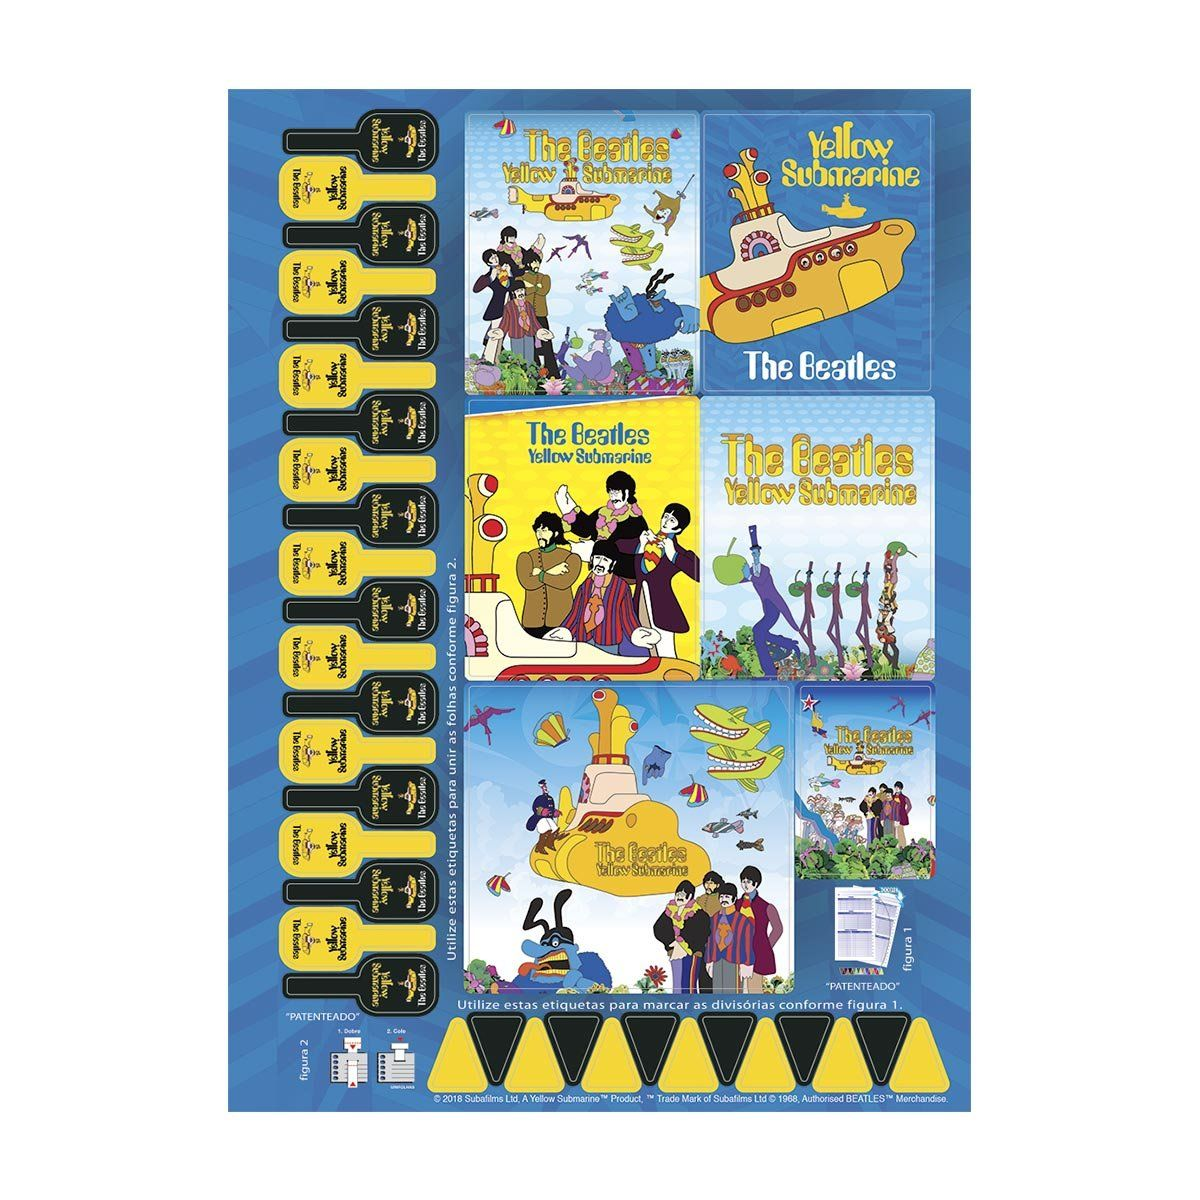 Caderno The Beatles Beatlesmarine 10 Matérias